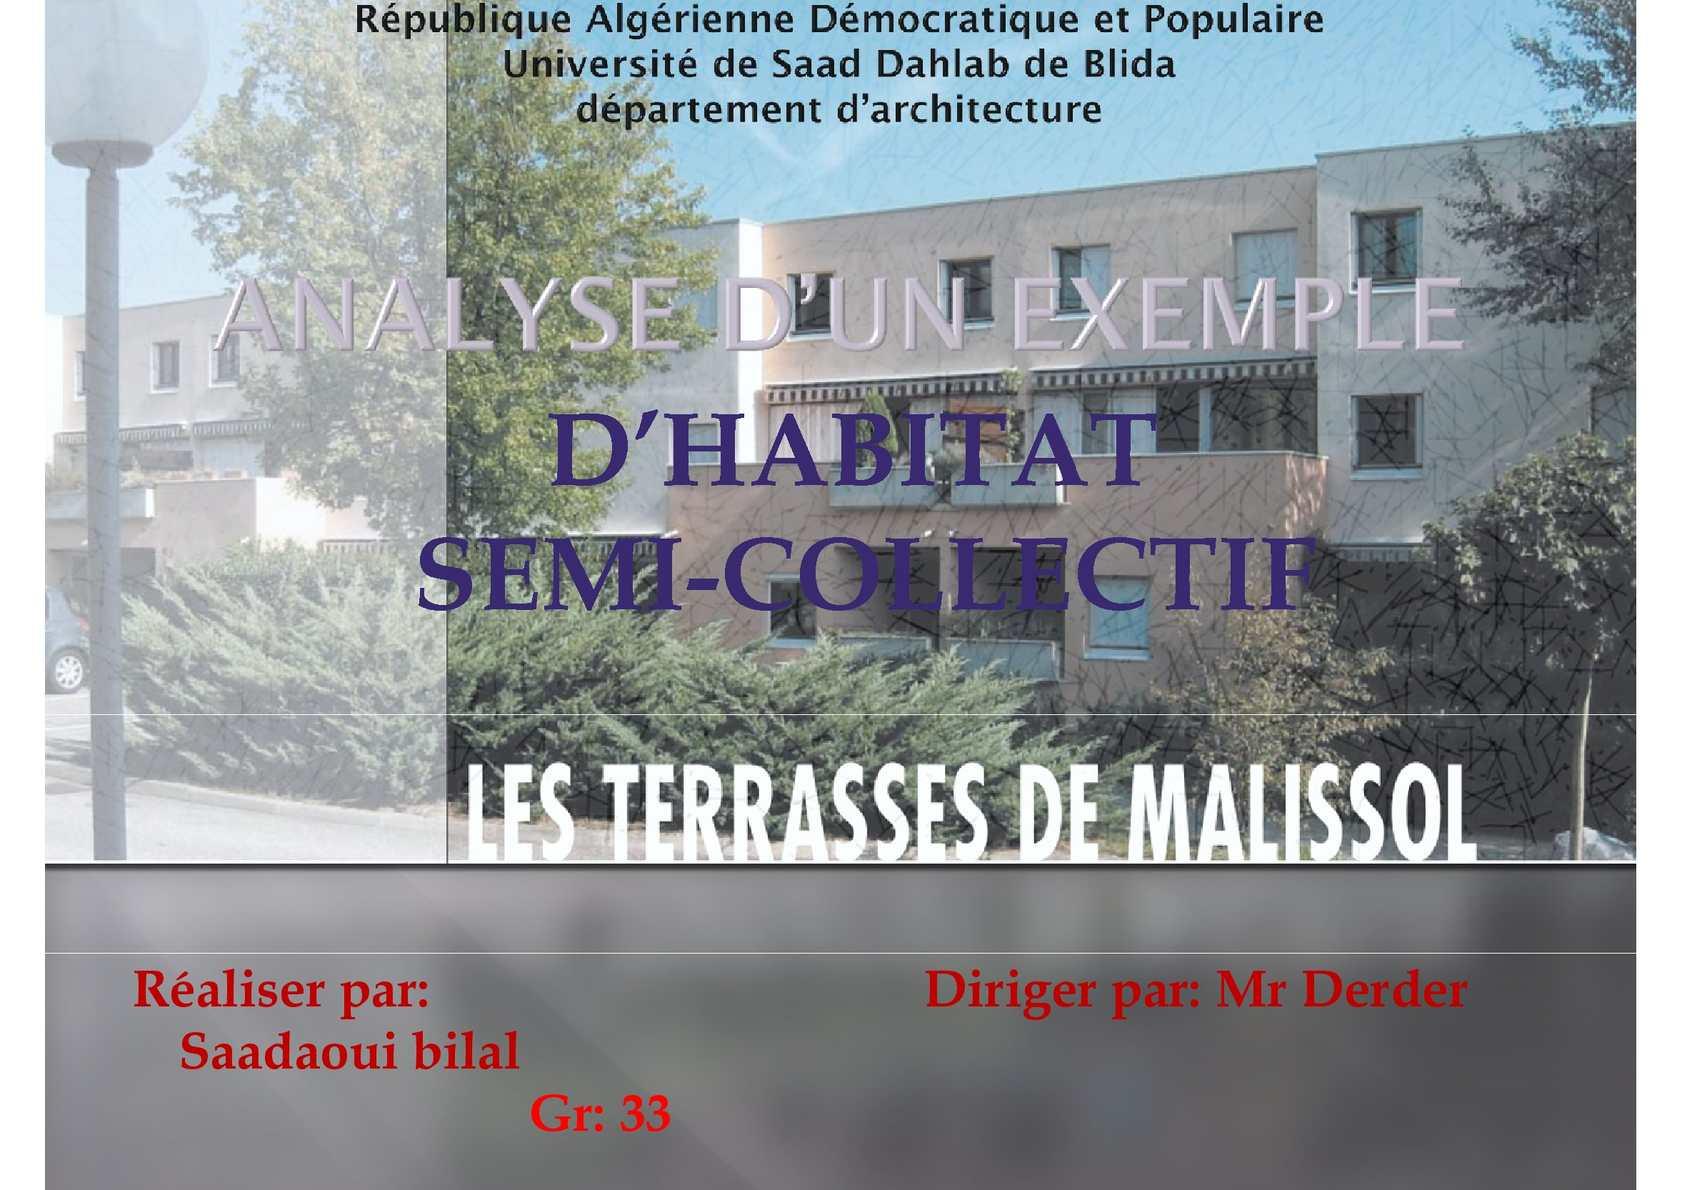 ANALYSE D'UN EXEMPLE D'HABITAT SEMI-COLLECTIF